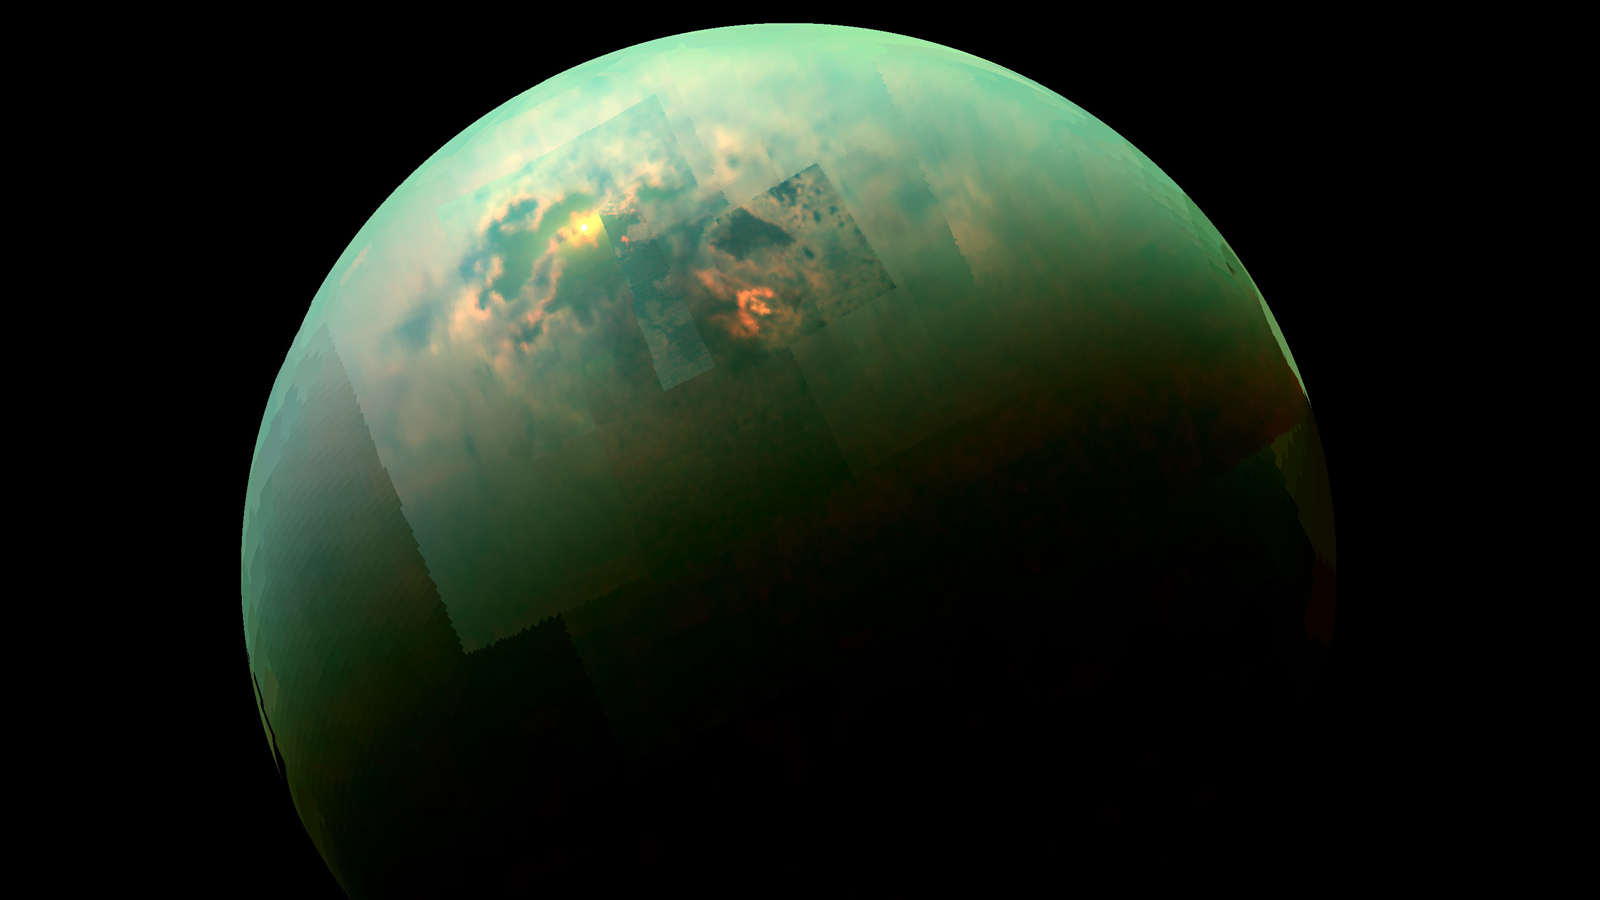 NASA's Cassini probe has discovered deep lakes on Saturn's moon Titan